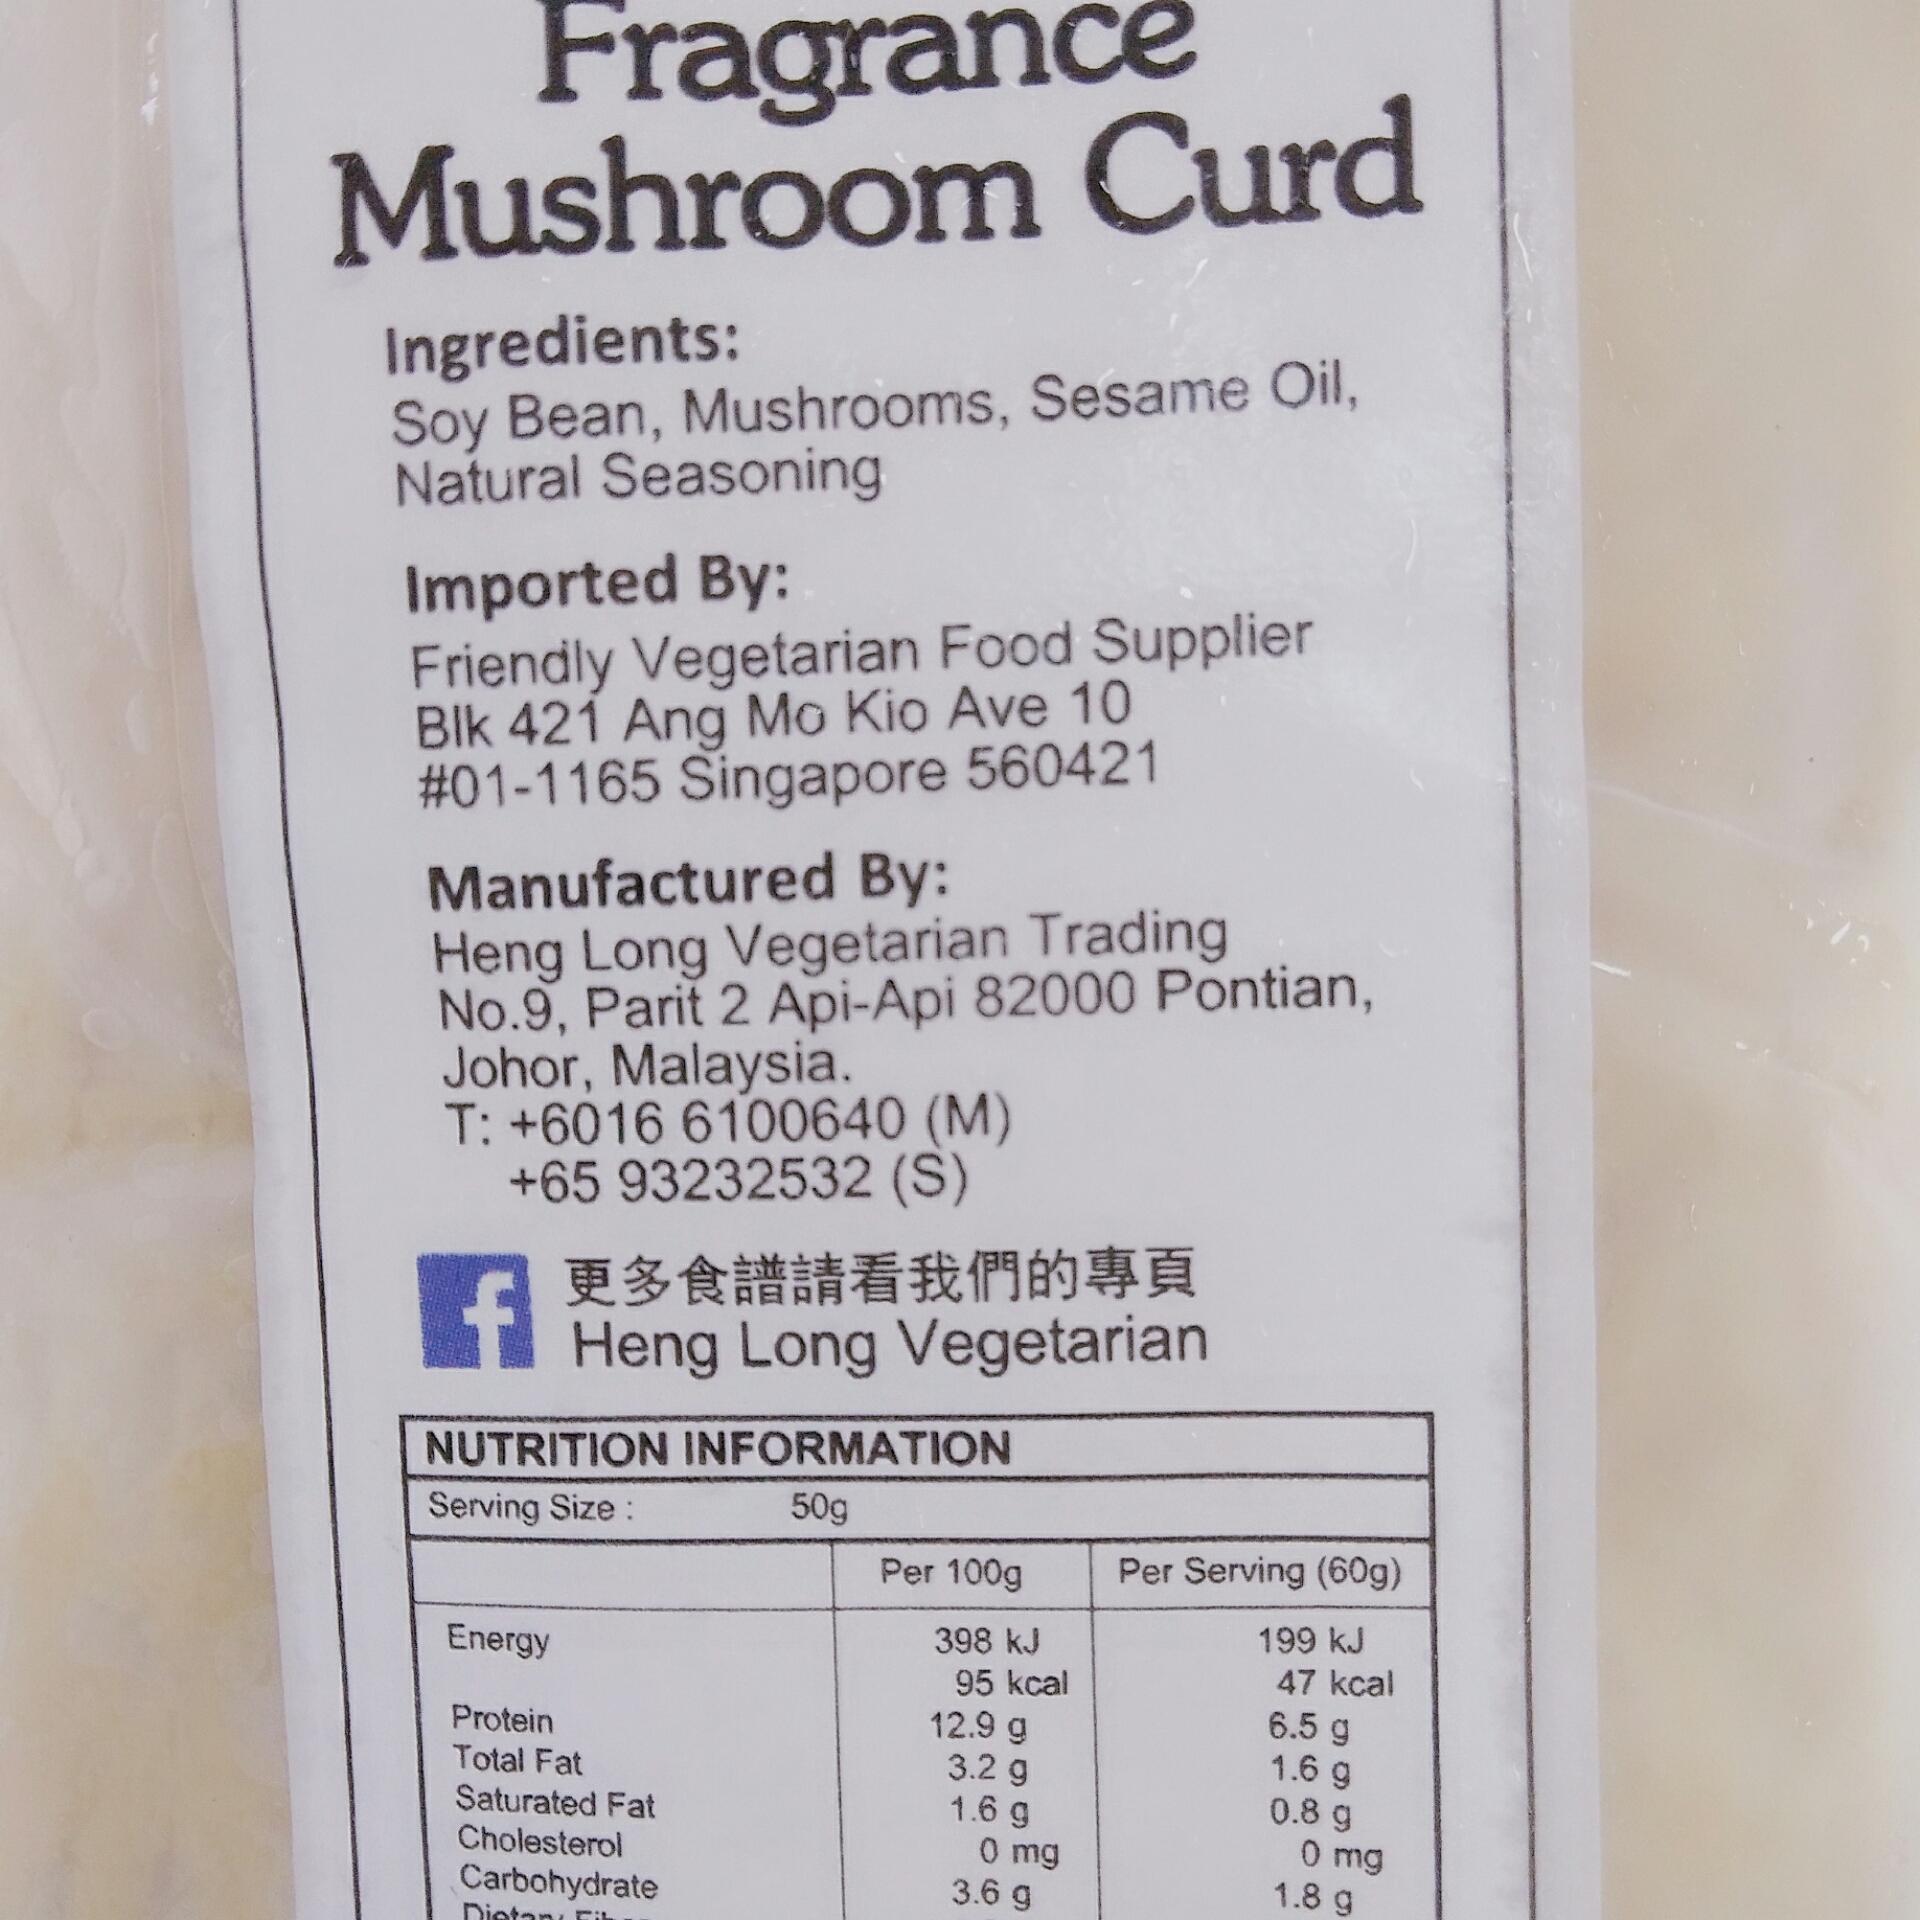 Image Fragrance Mushroom Curd 兴隆 - 一条龙 230grams